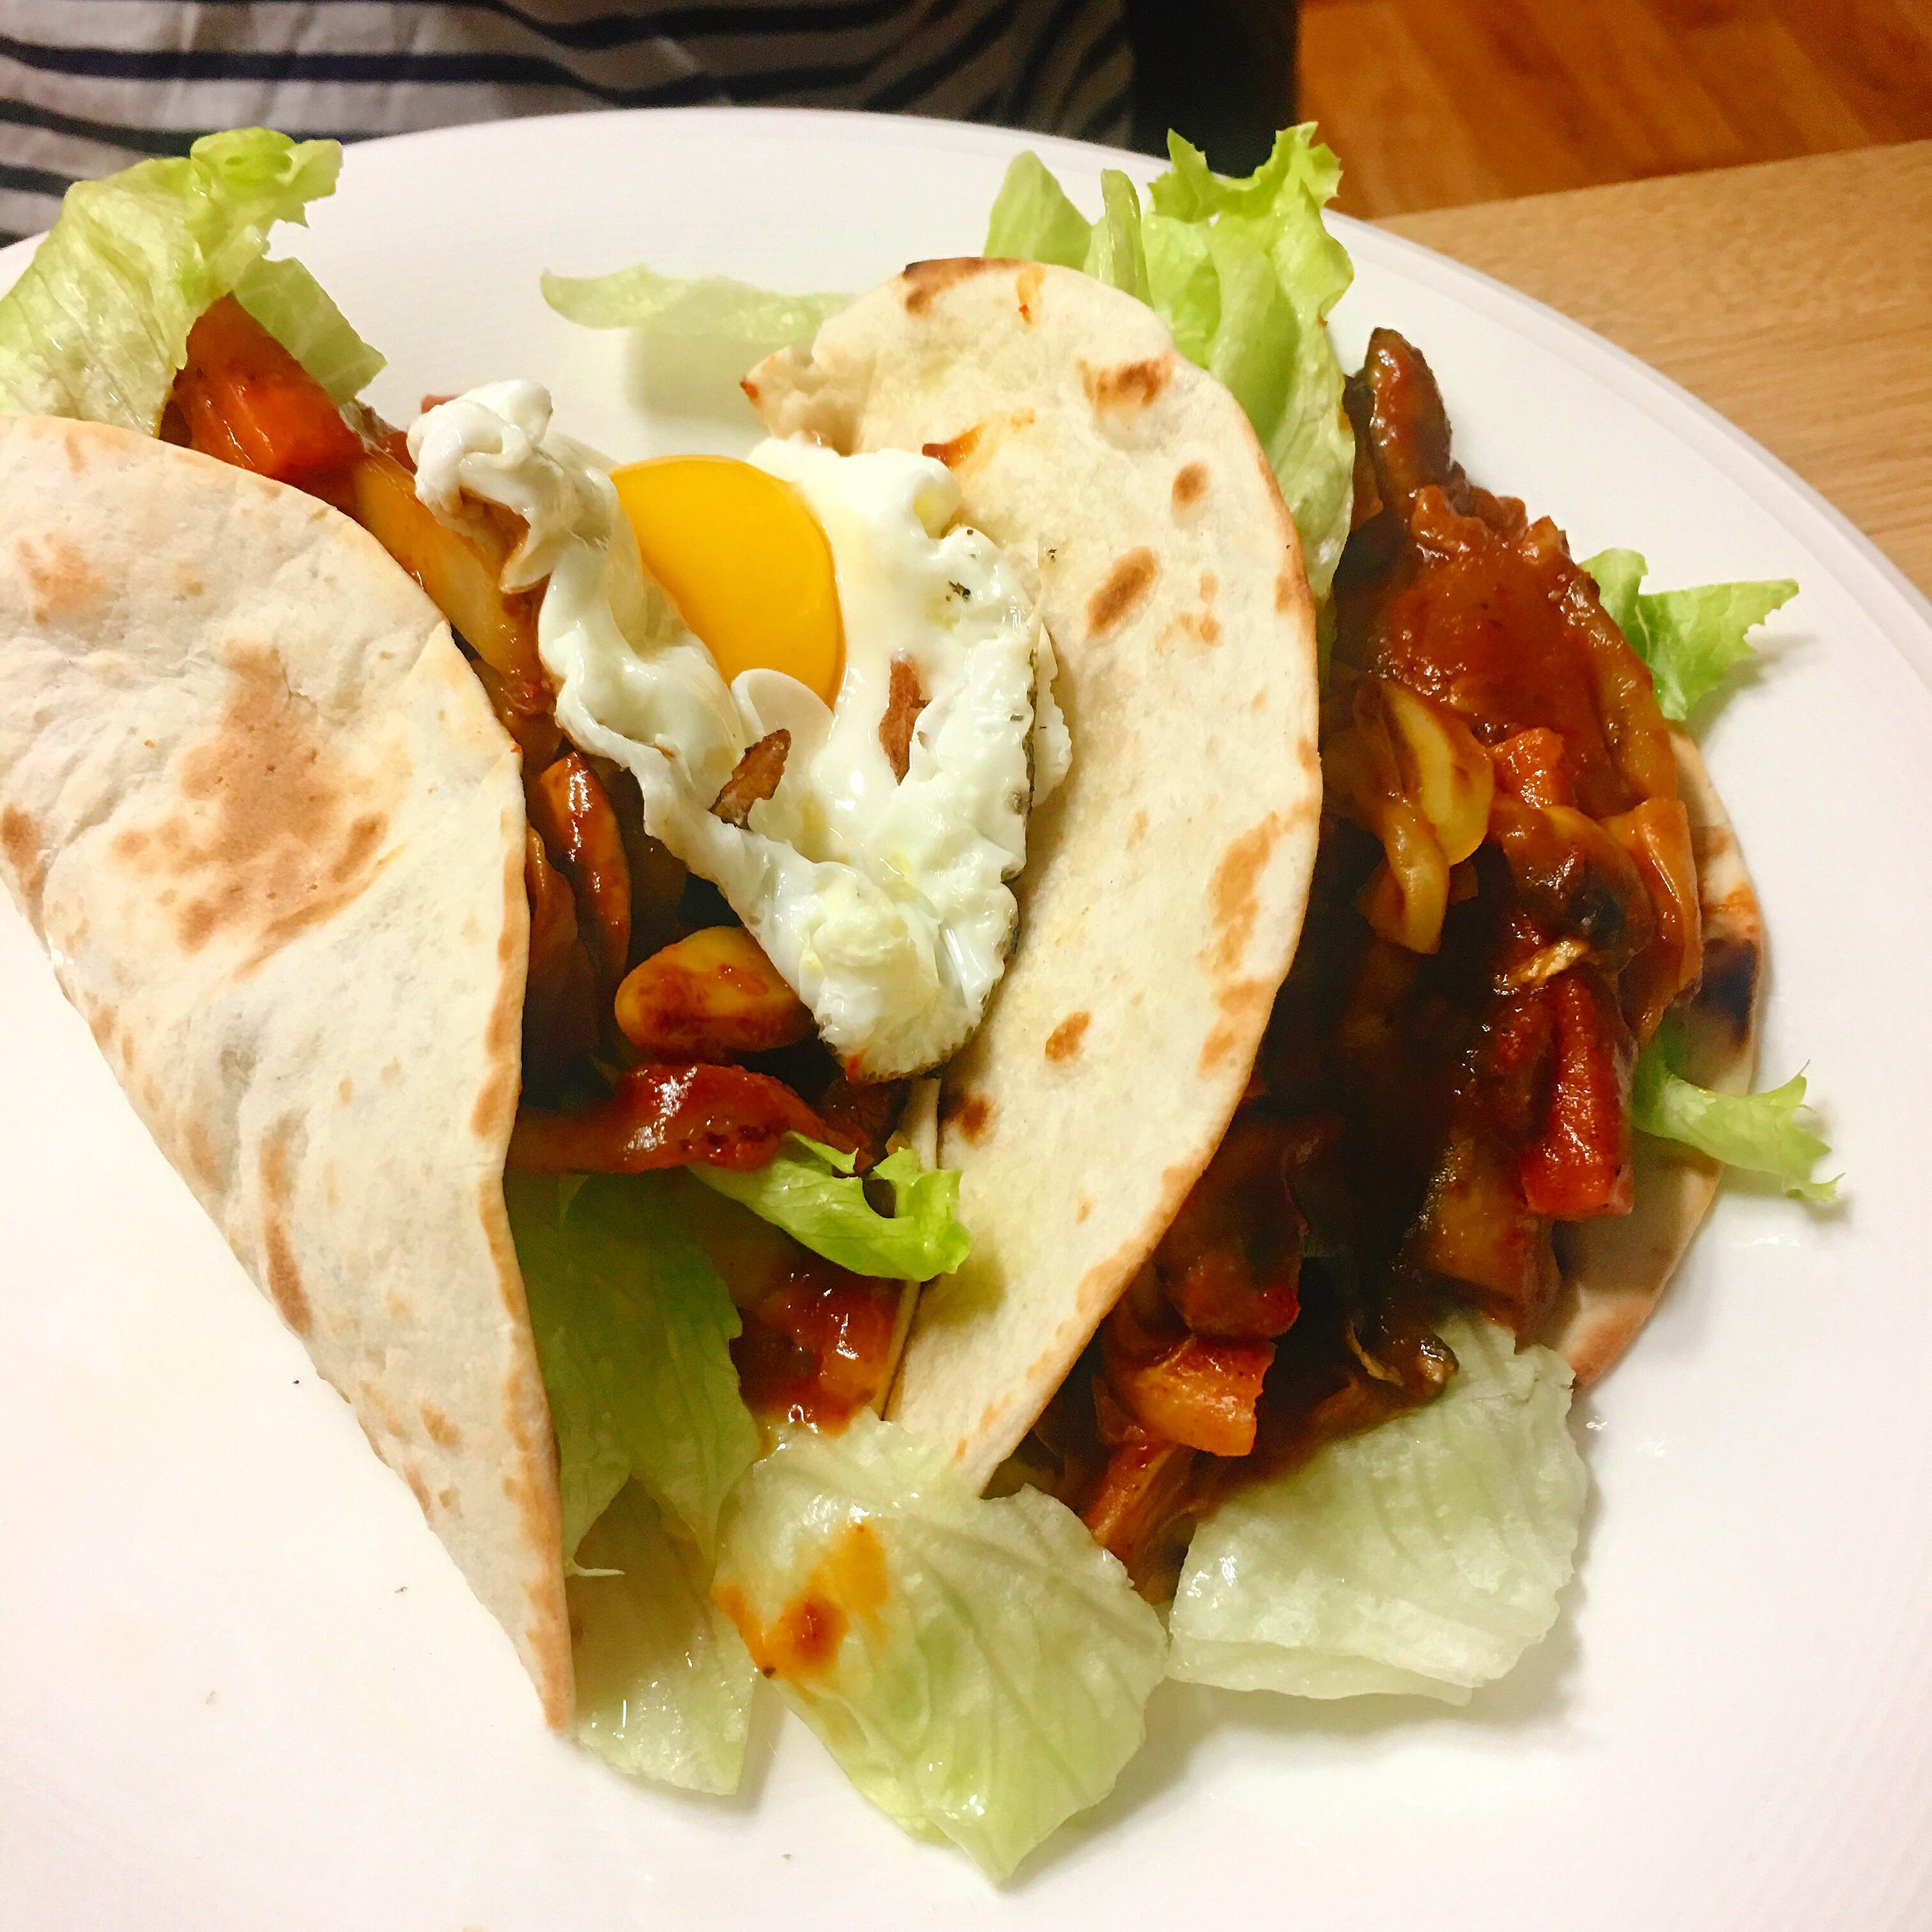 Mushroom and Onion Vegetarian Tacos PJpipii